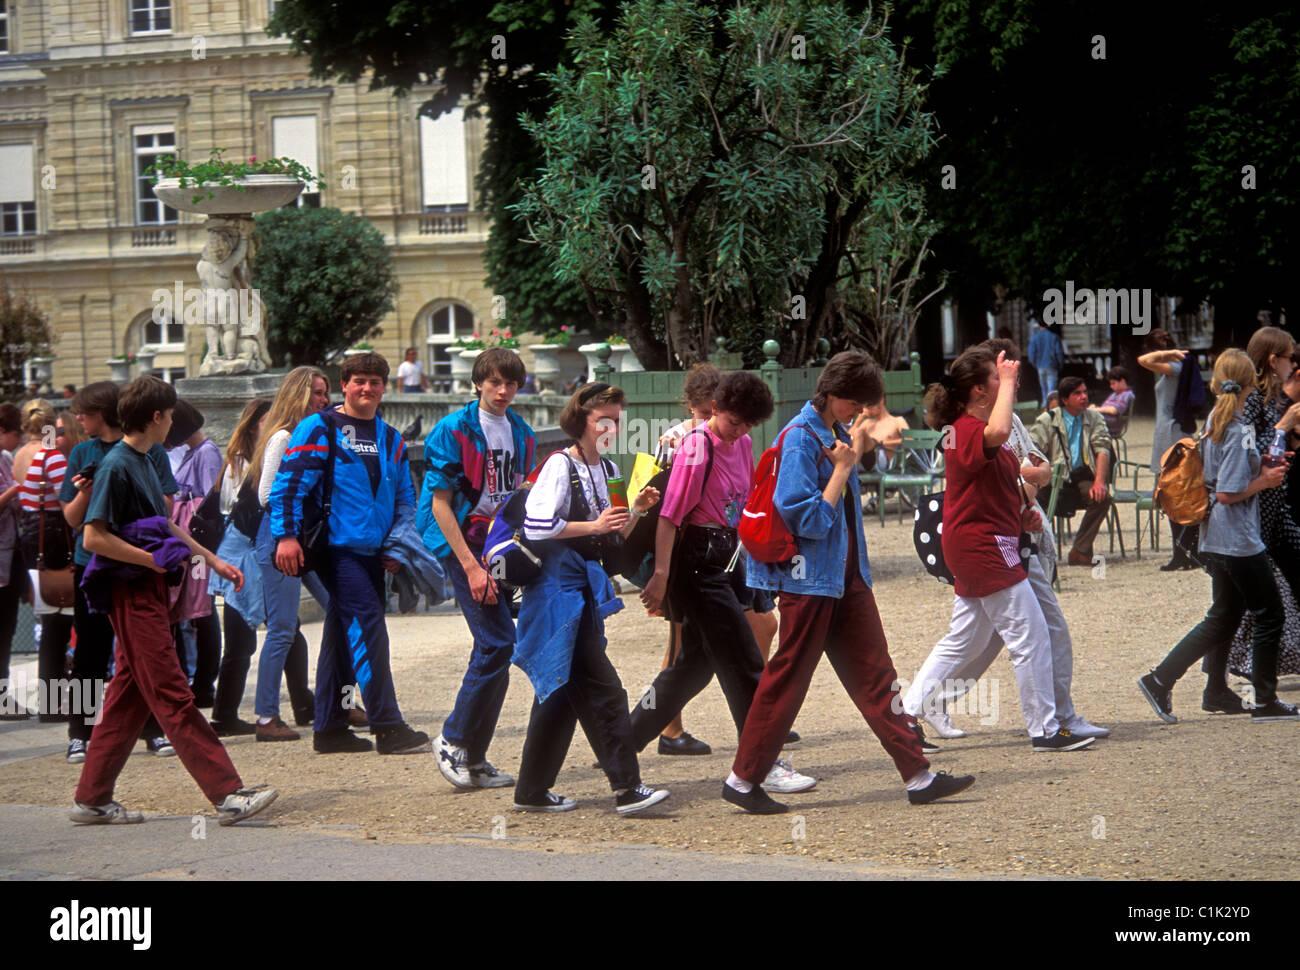 French students, teenage girls, teenage boys, students, teens, teenagers, student field trip, Paris, Ile-de-France, - Stock Image